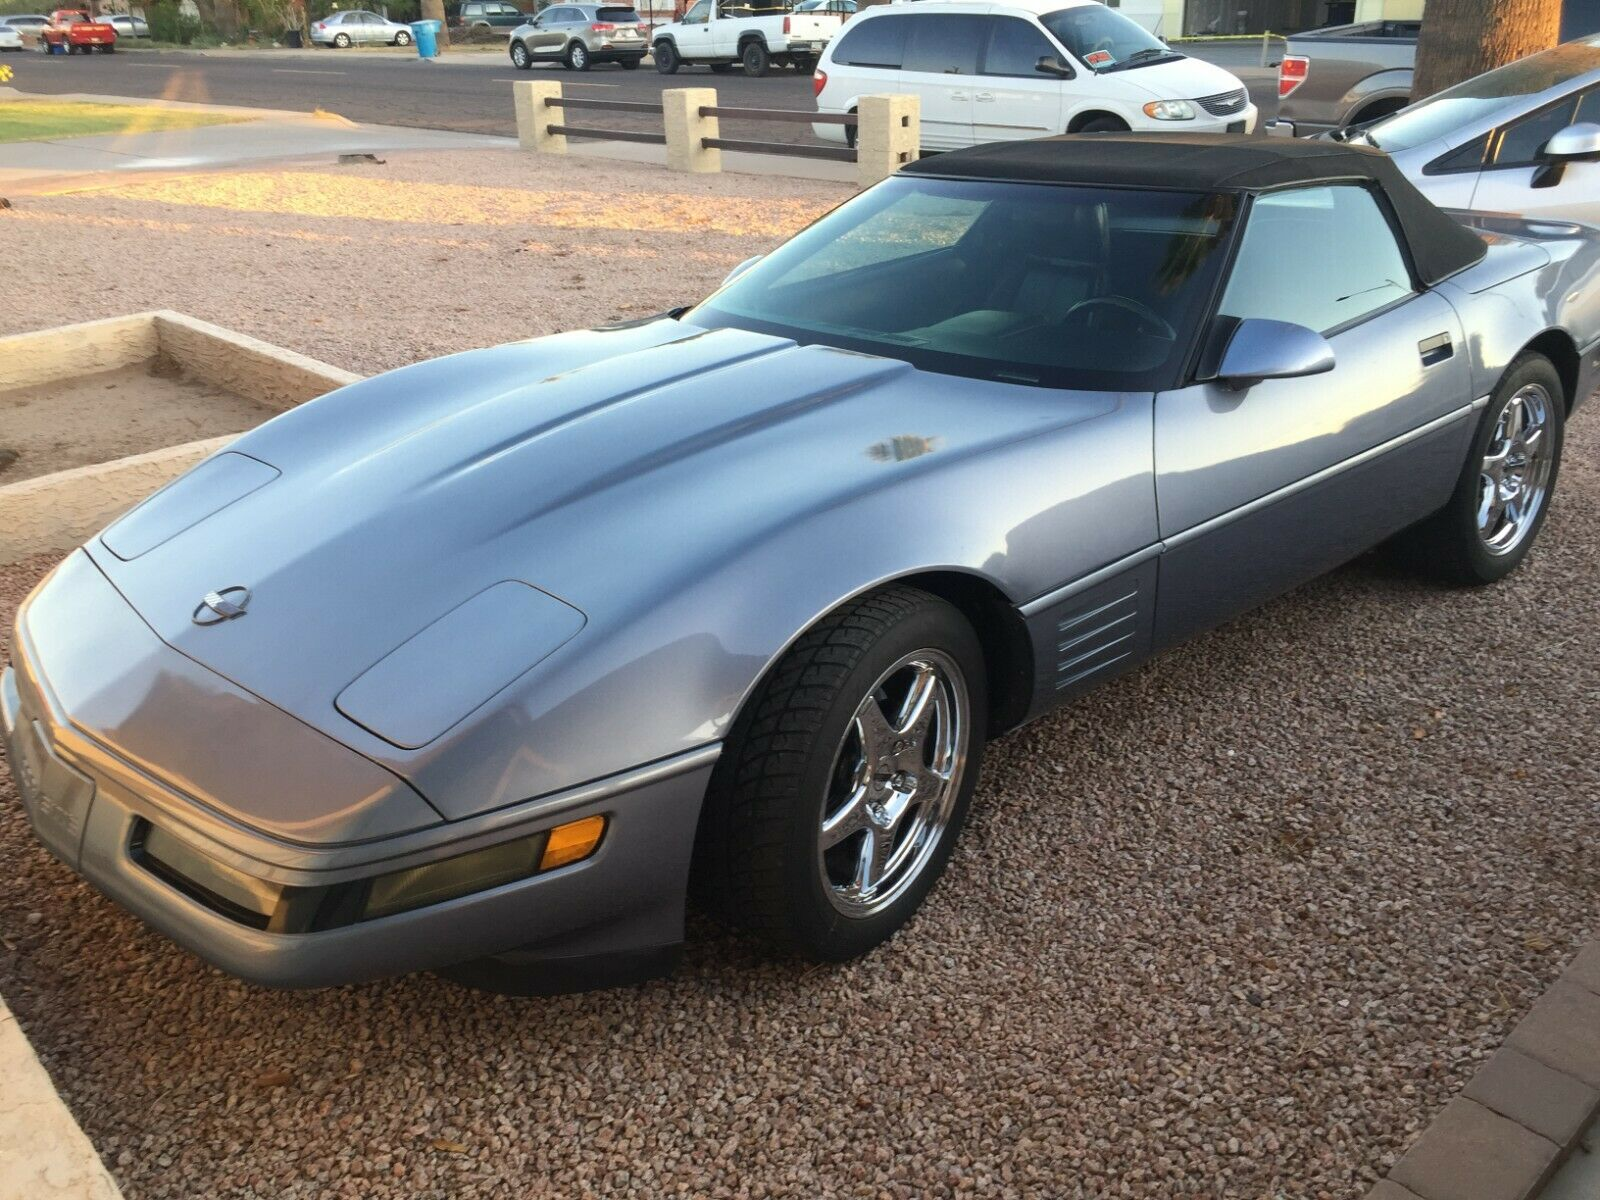 1991 Blue Chevrolet Corvette   | C4 Corvette Photo 1